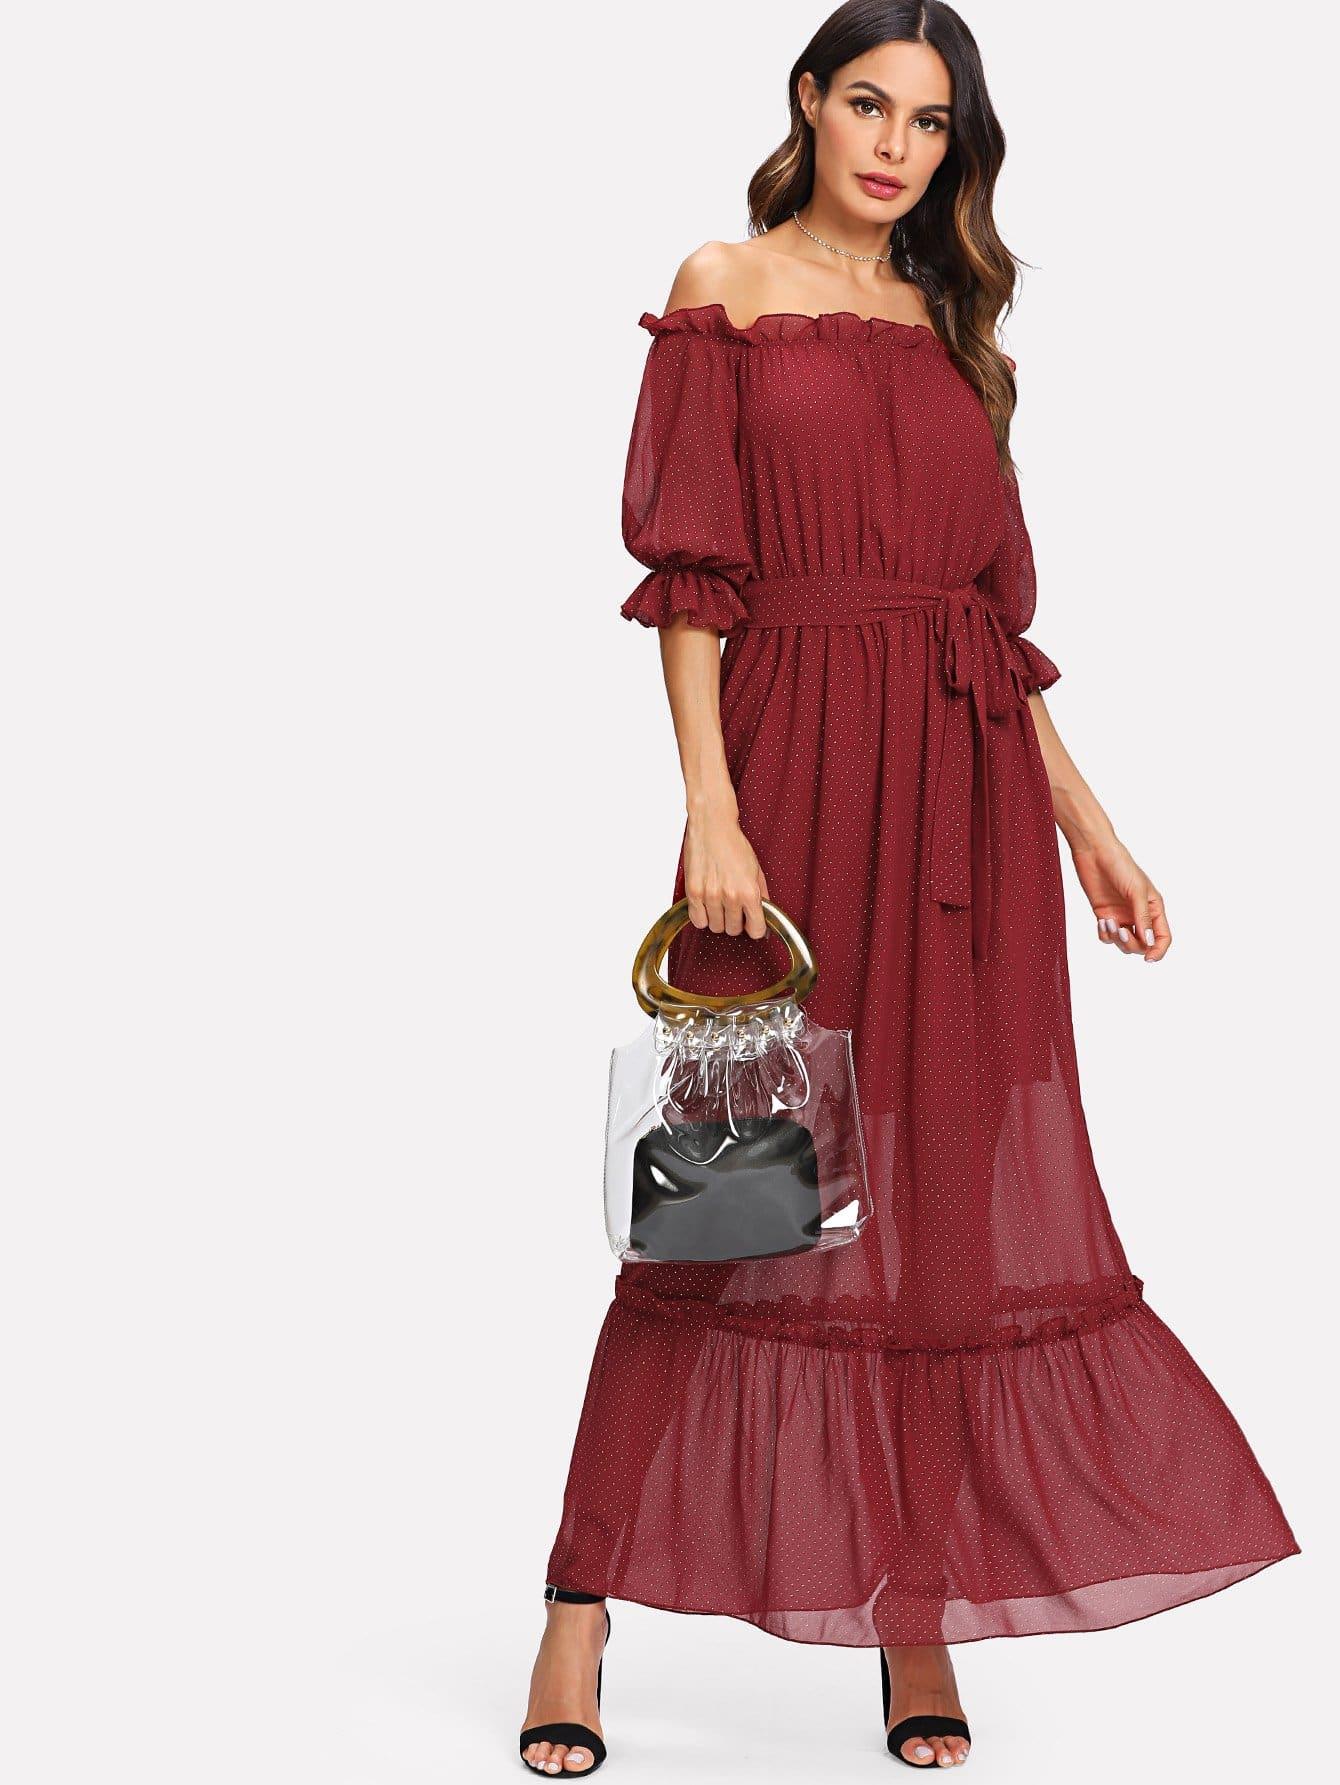 Polka Dot Frill Trim Layered Hem Belted Bardot Dress girls frill trim polka dot dress